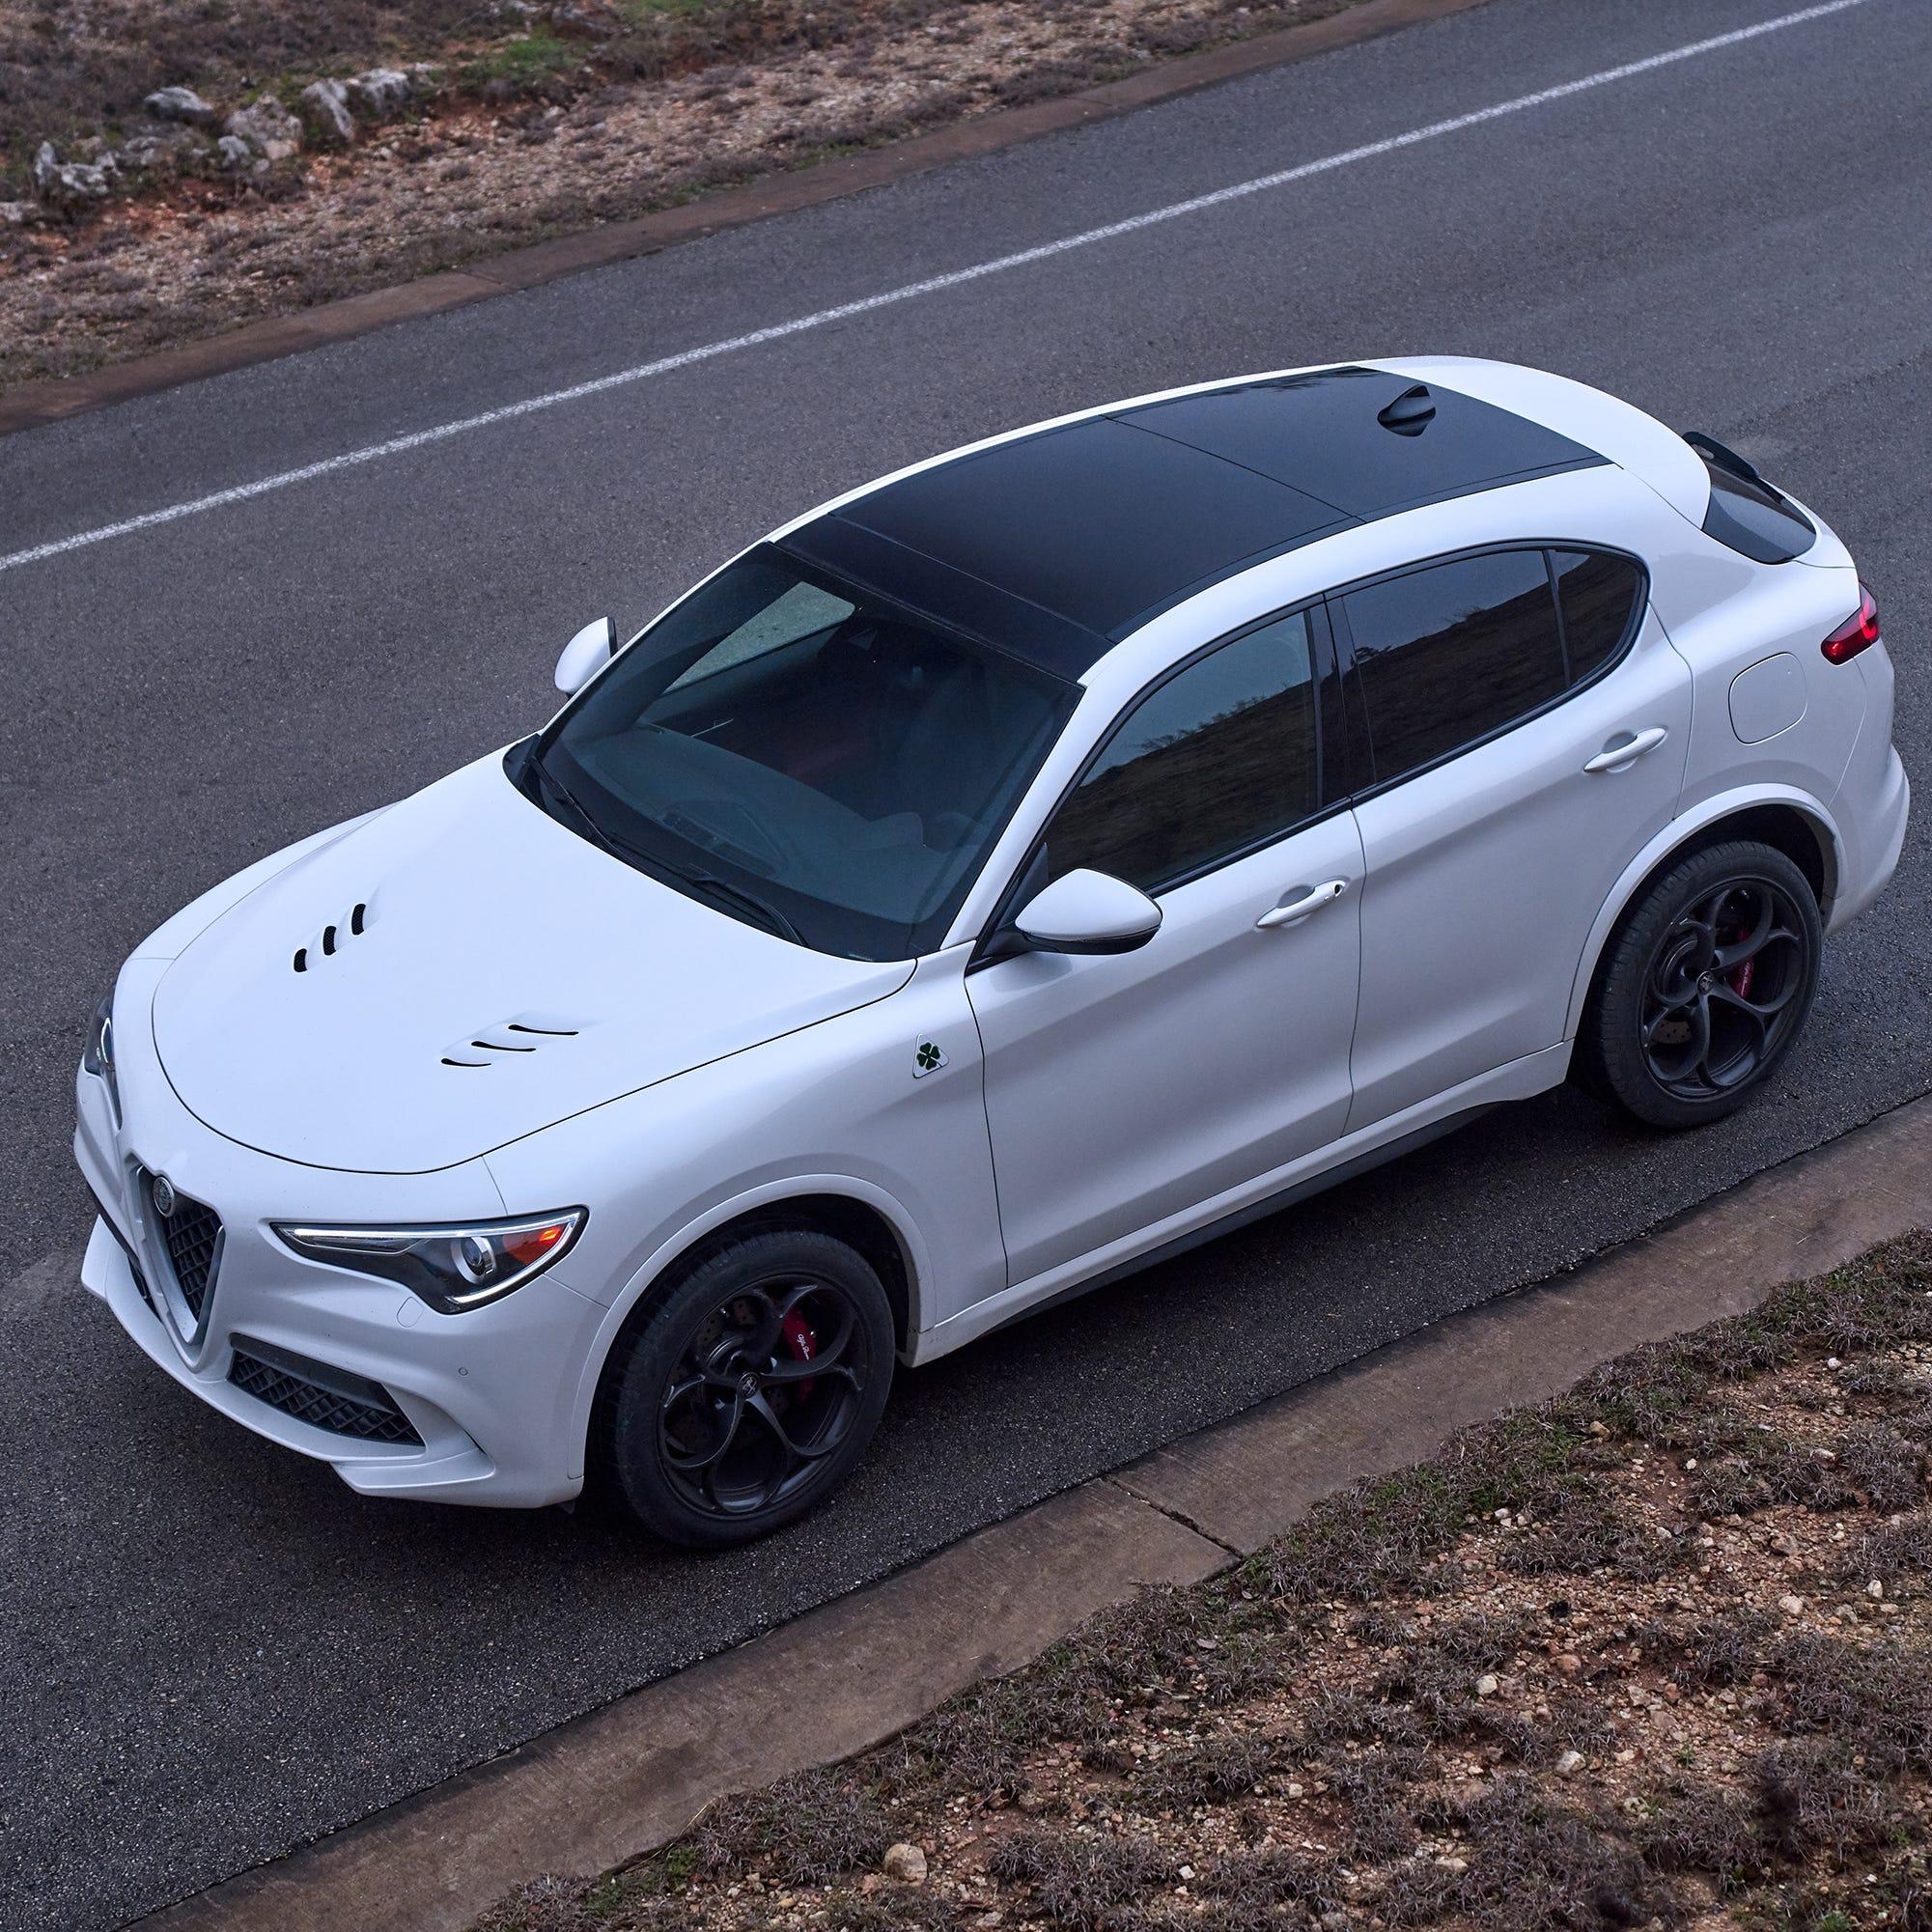 2019 Alfa Romeo Stelvio SUV doesn't look or feel like any other